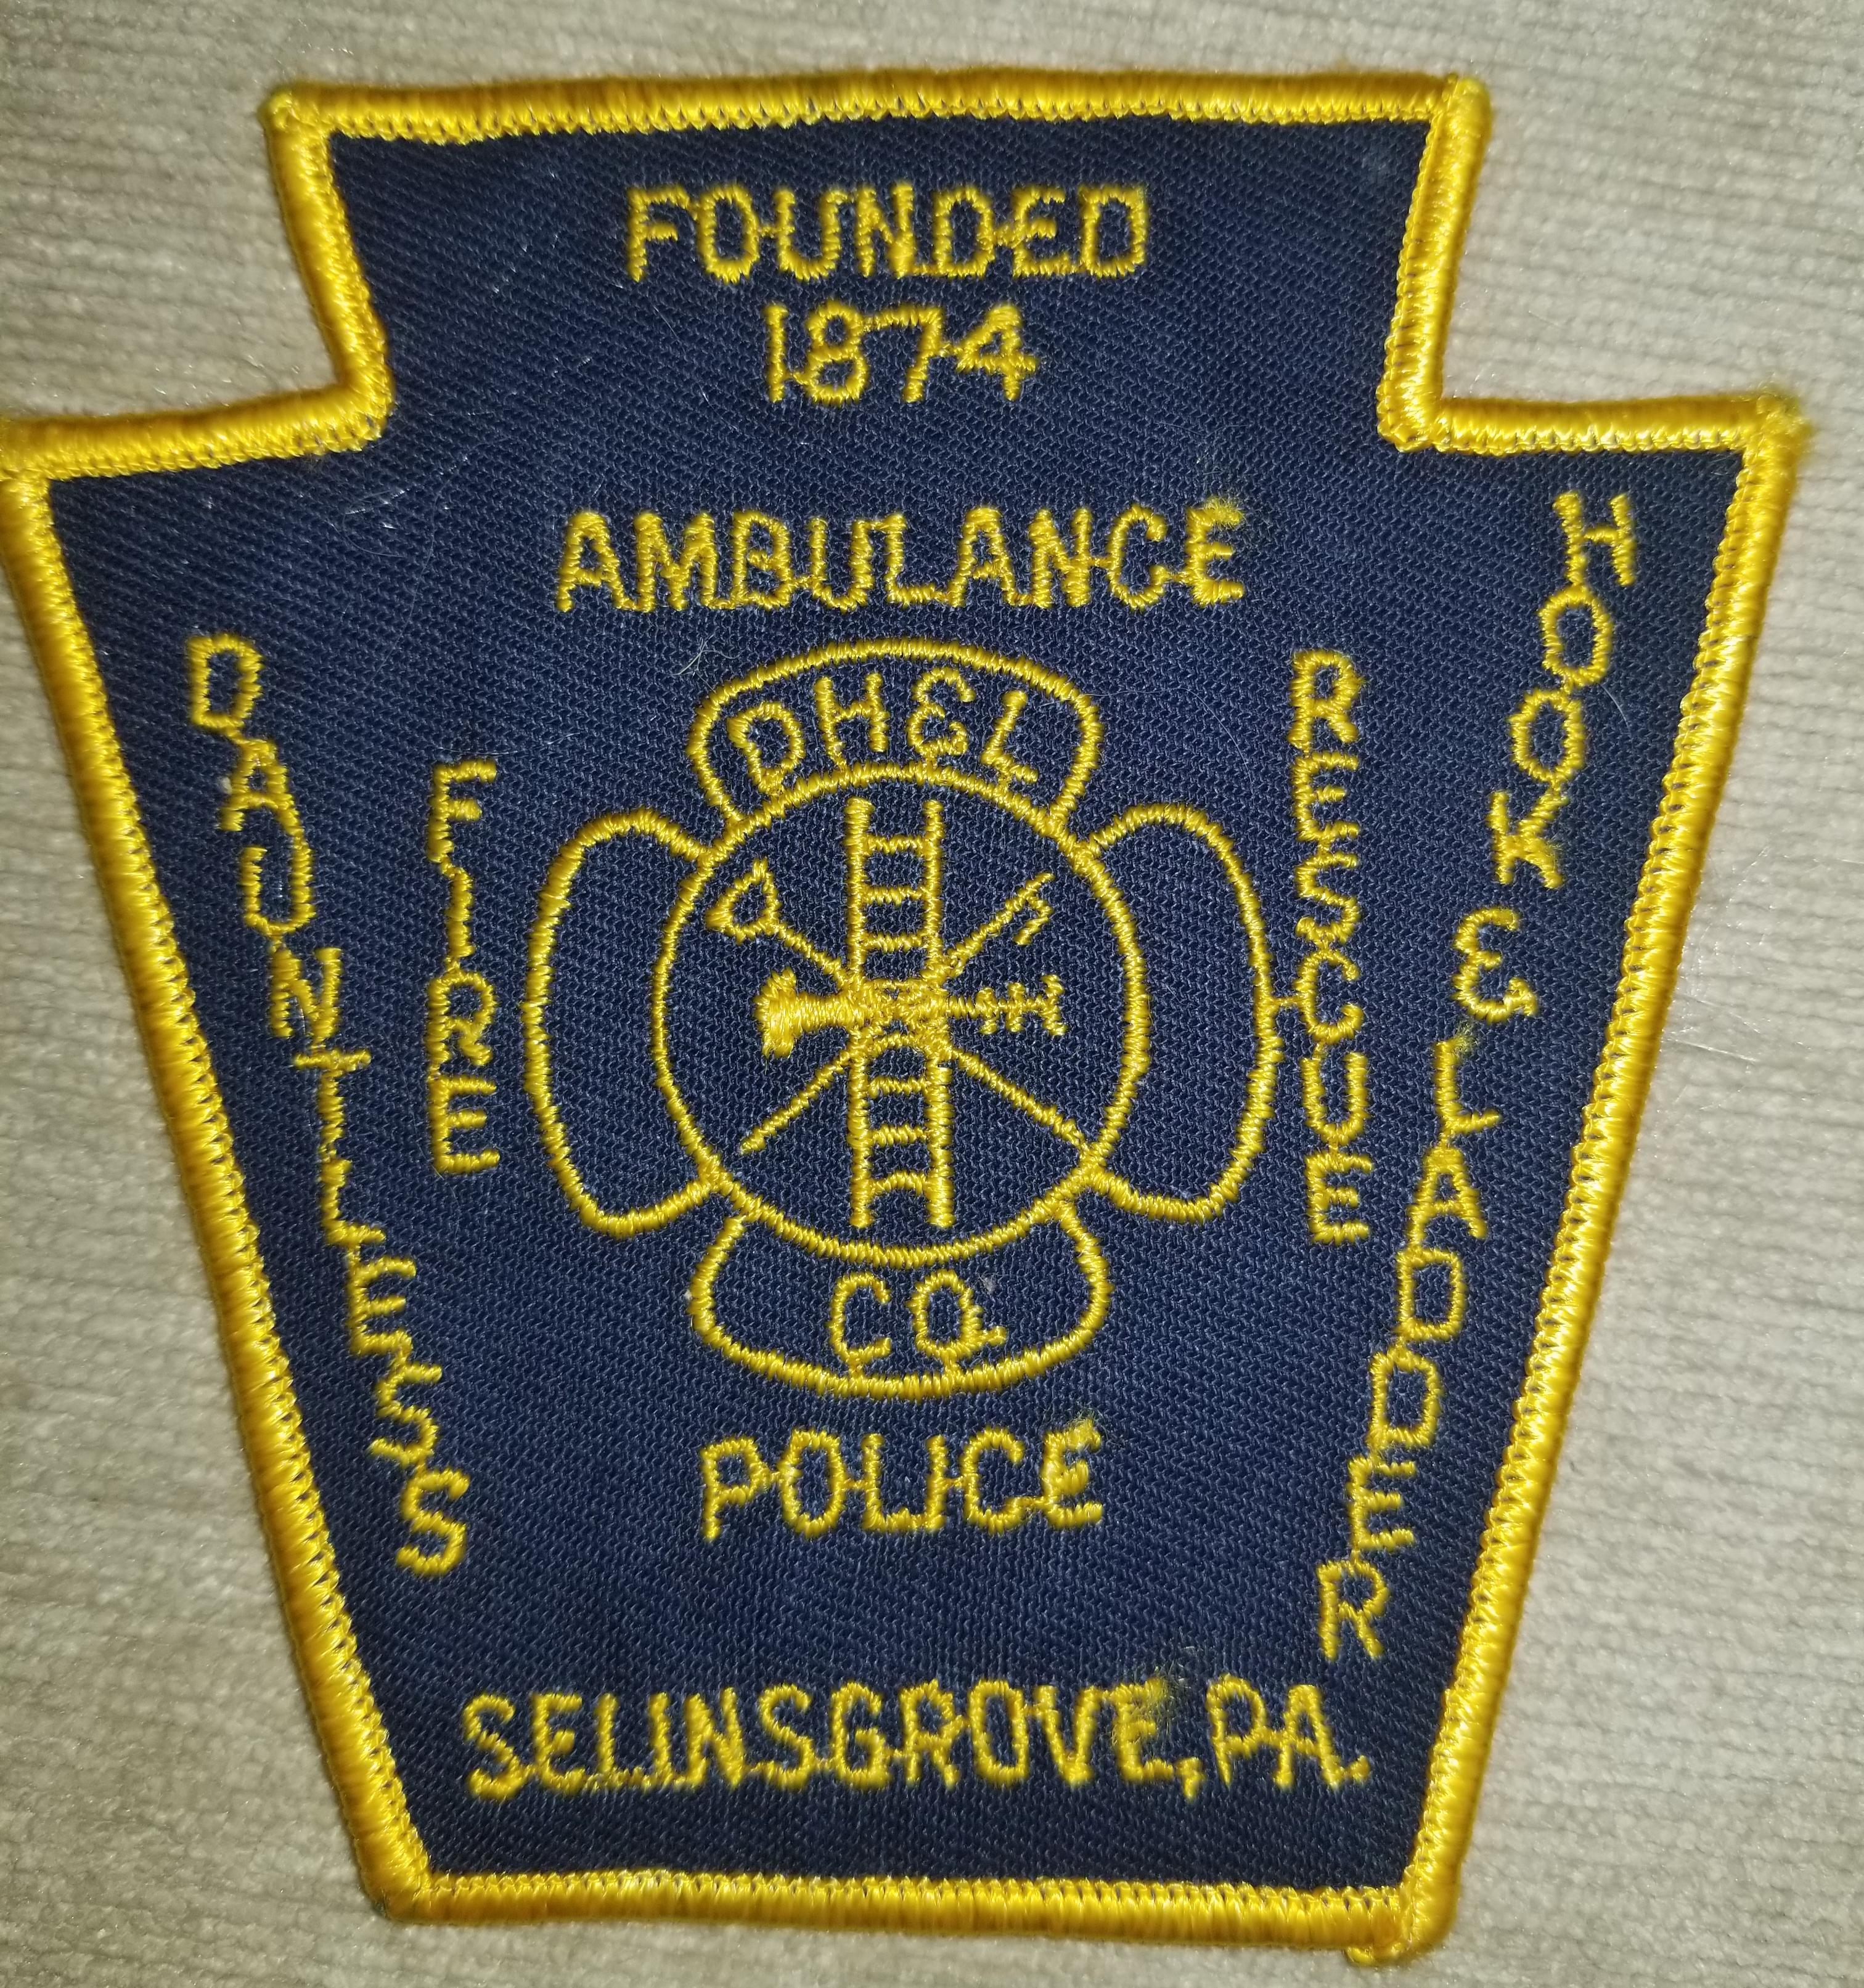 Dauntless Hook & Ladder Fire Police Seli